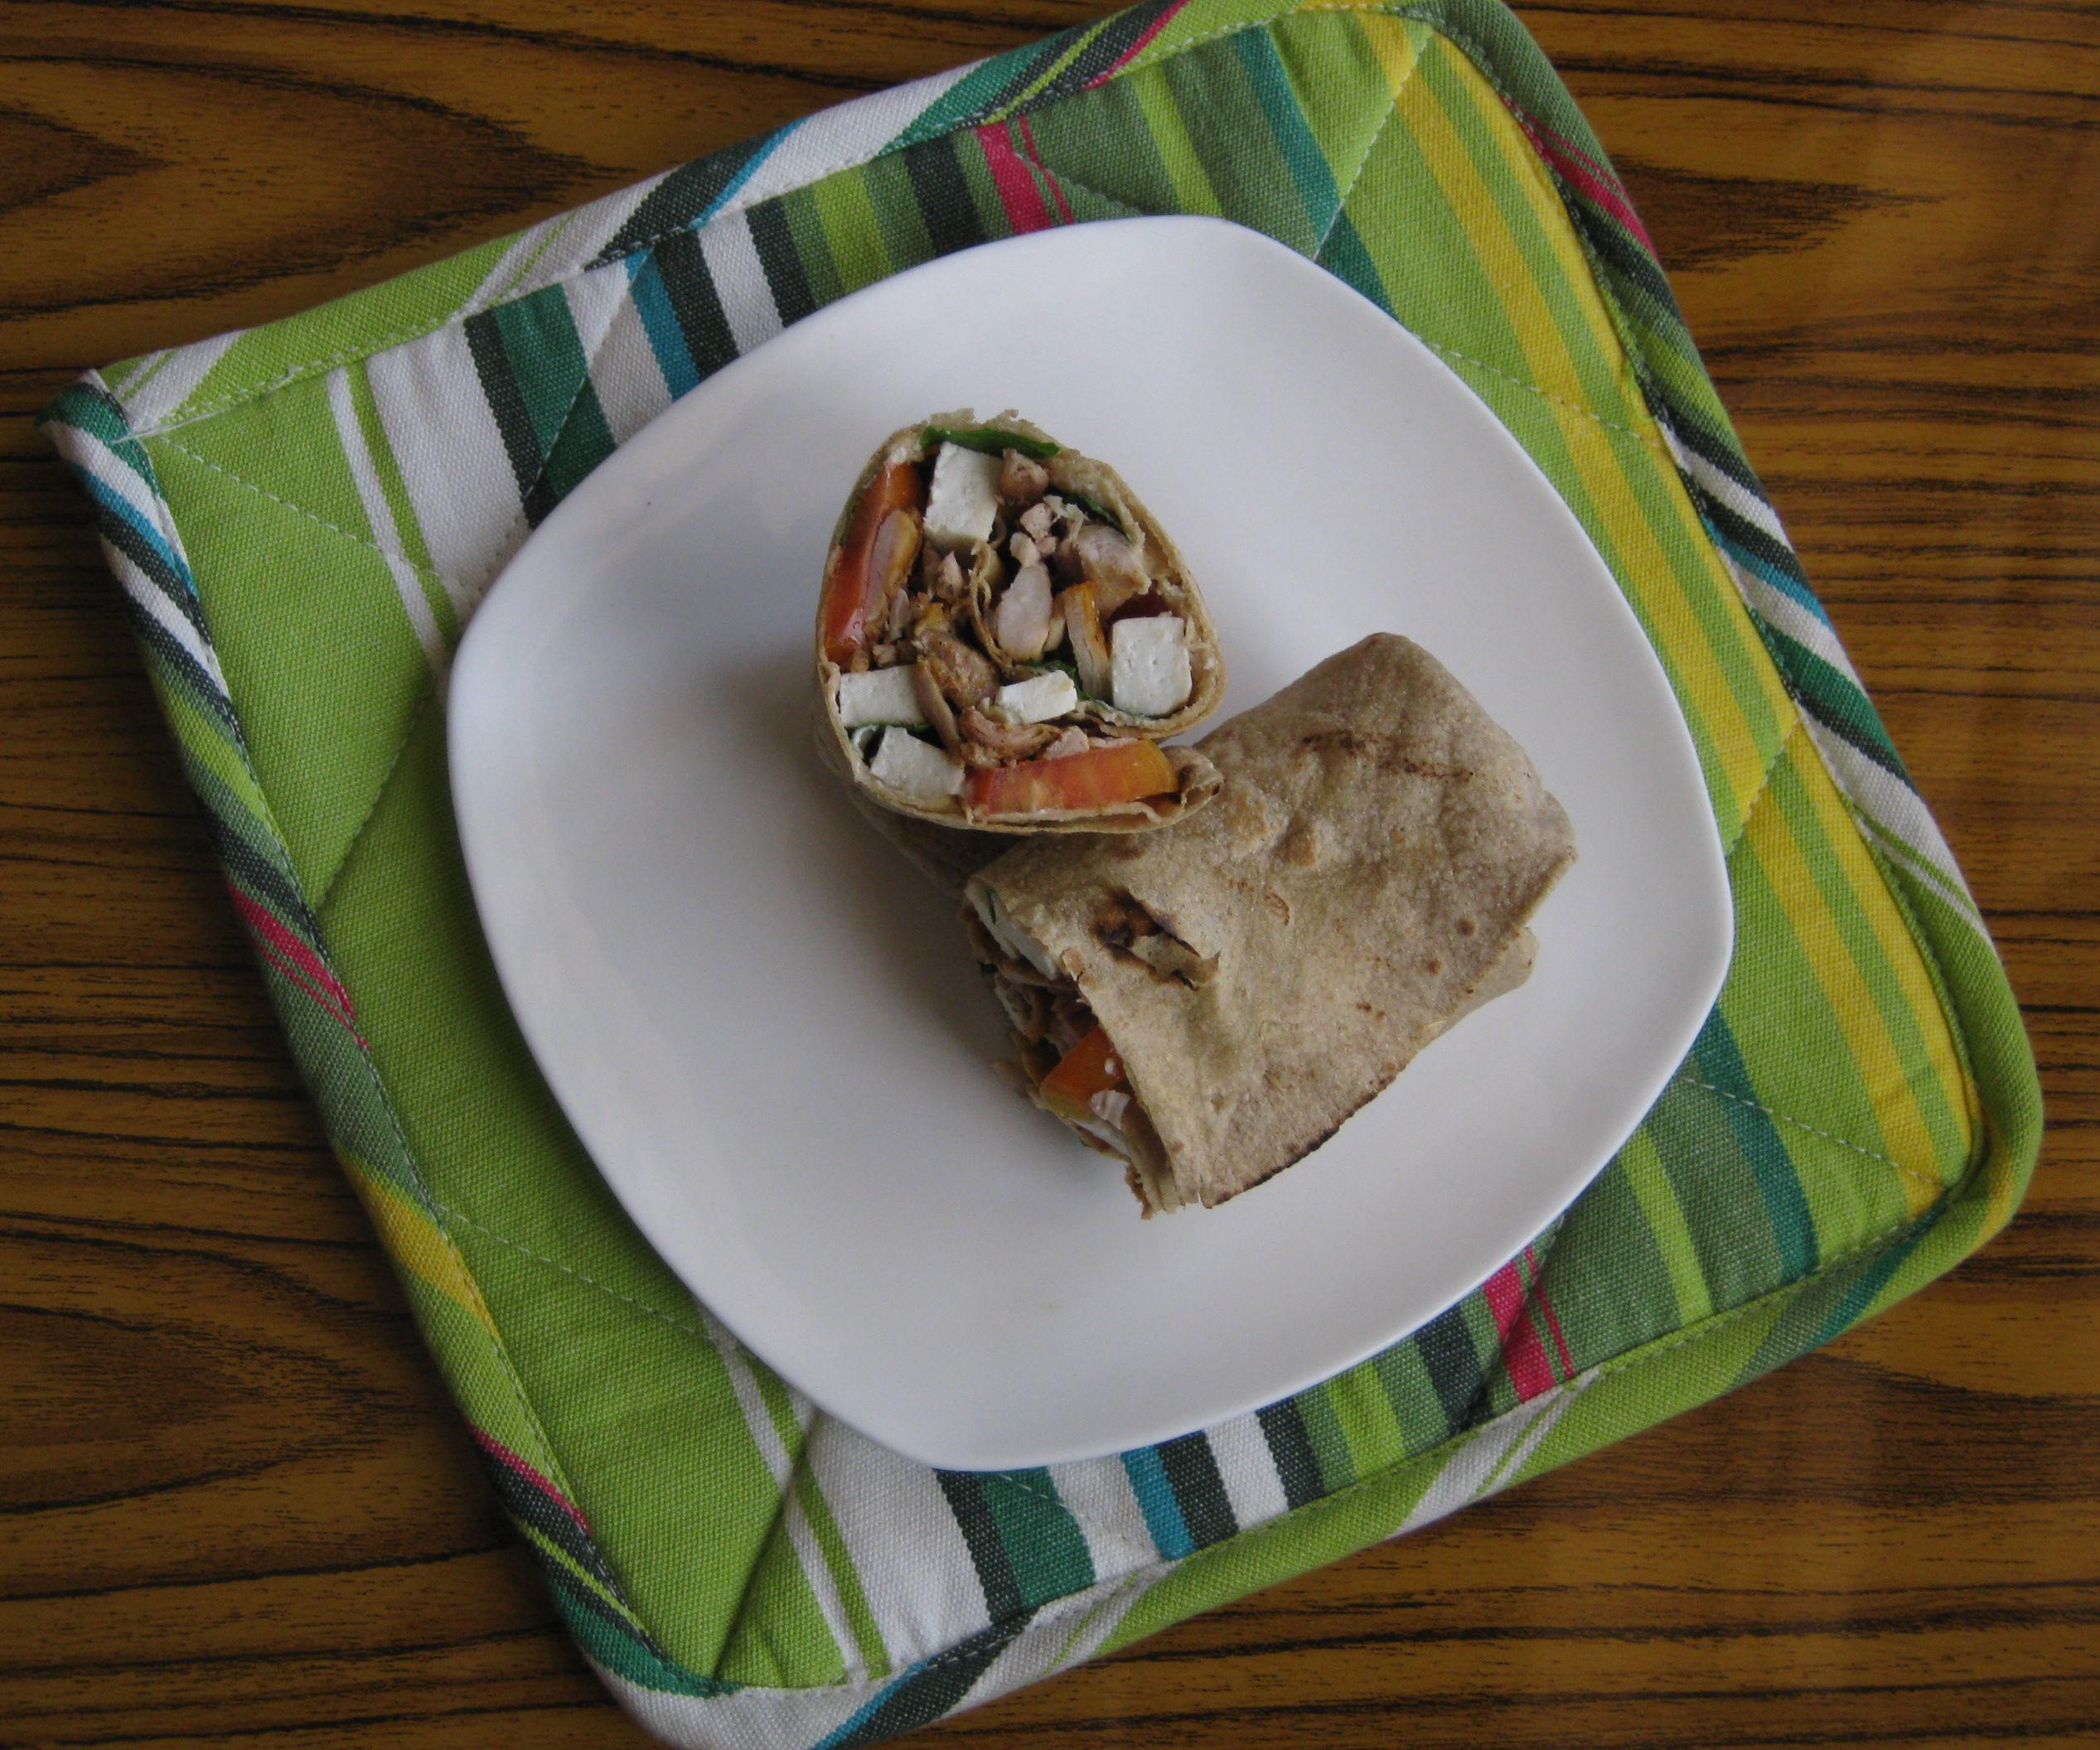 Healthy sandwich wraps, whole grain (chapatti Pakistani innovation)